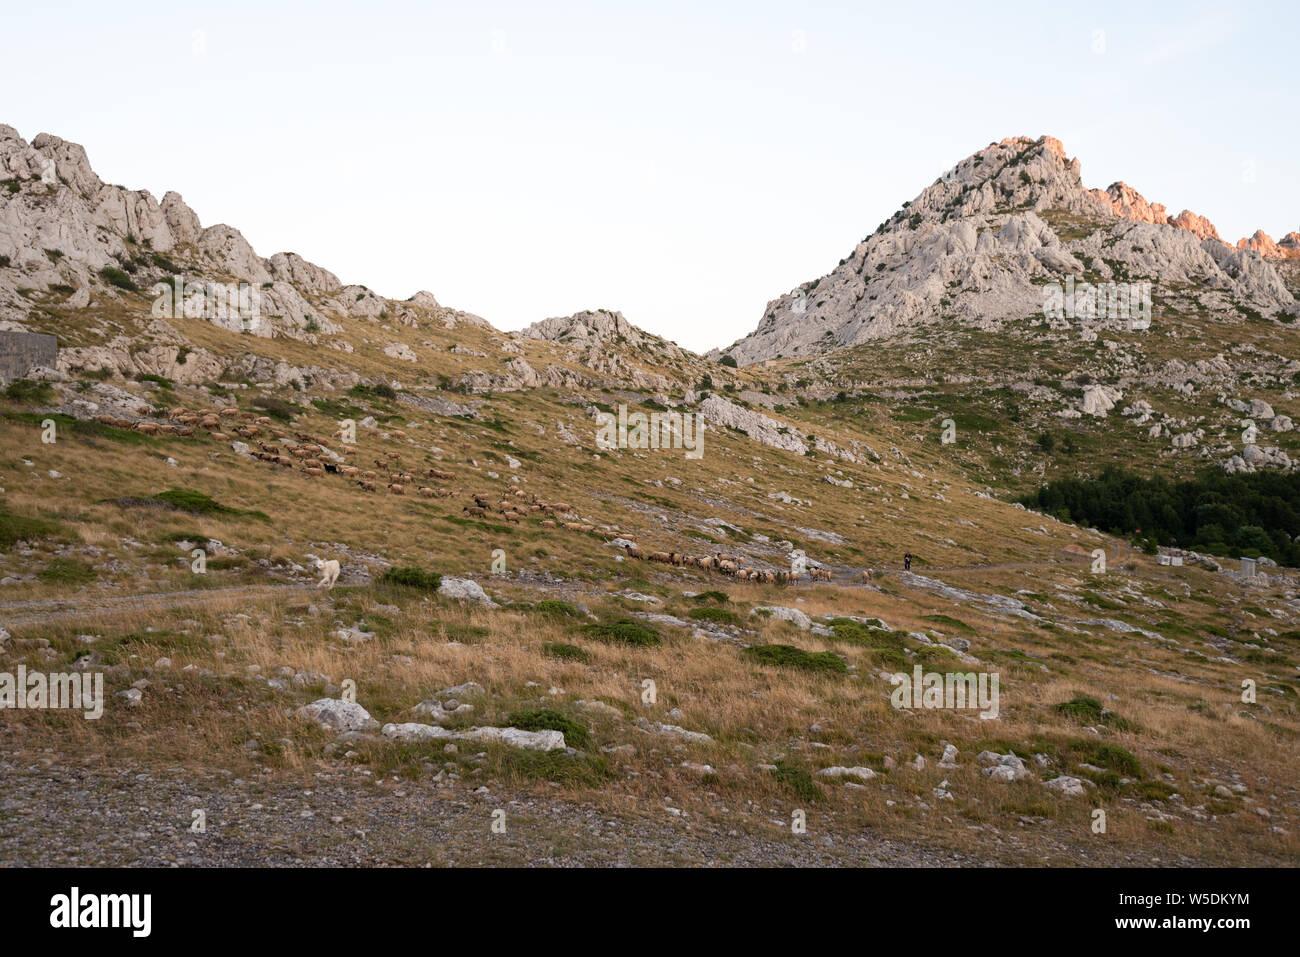 Tulove Grede, Velebit Mountain, Croatia Stock Photo